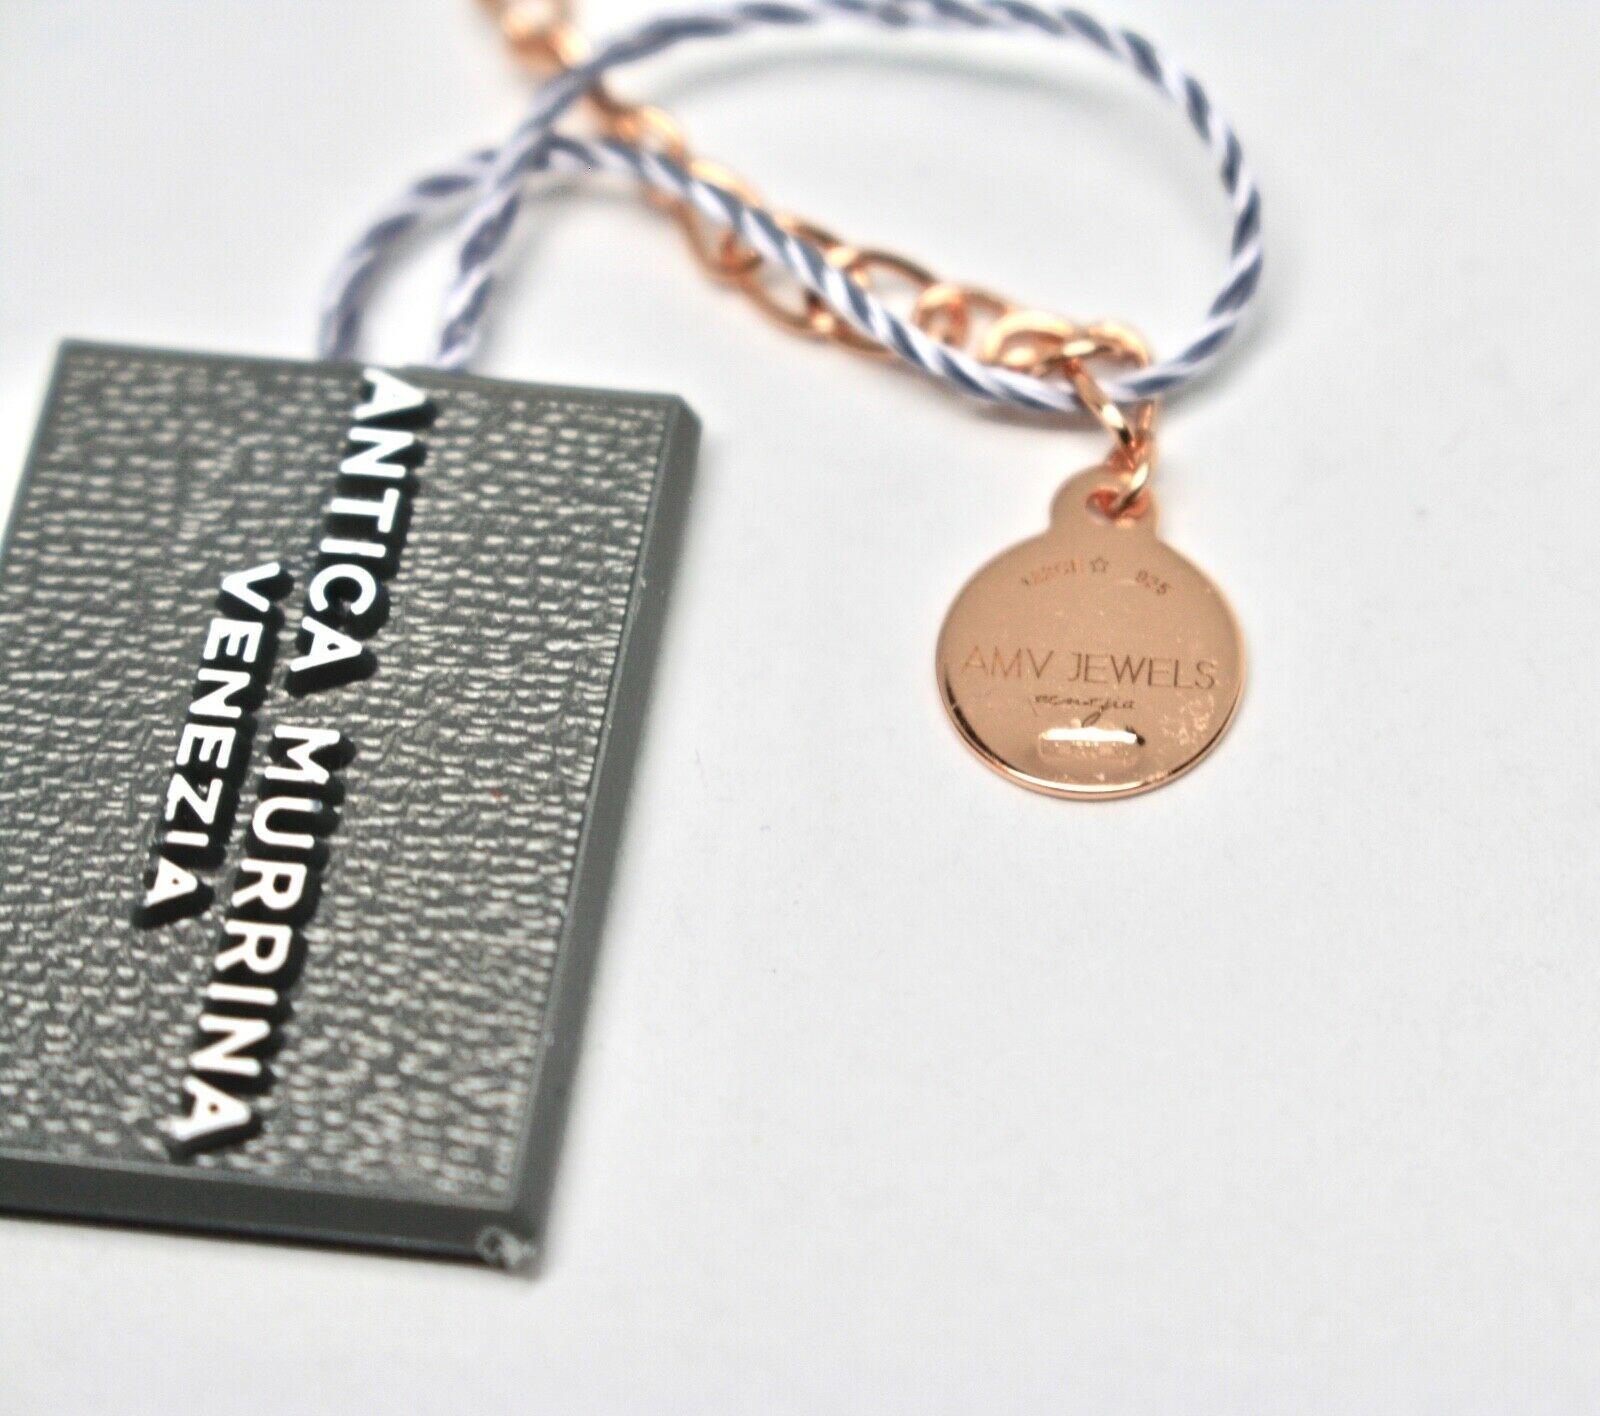 Collar Antica Murrina Venezia de Plata 925 con Cristal de Murano AMVJWCP009C03 image 8